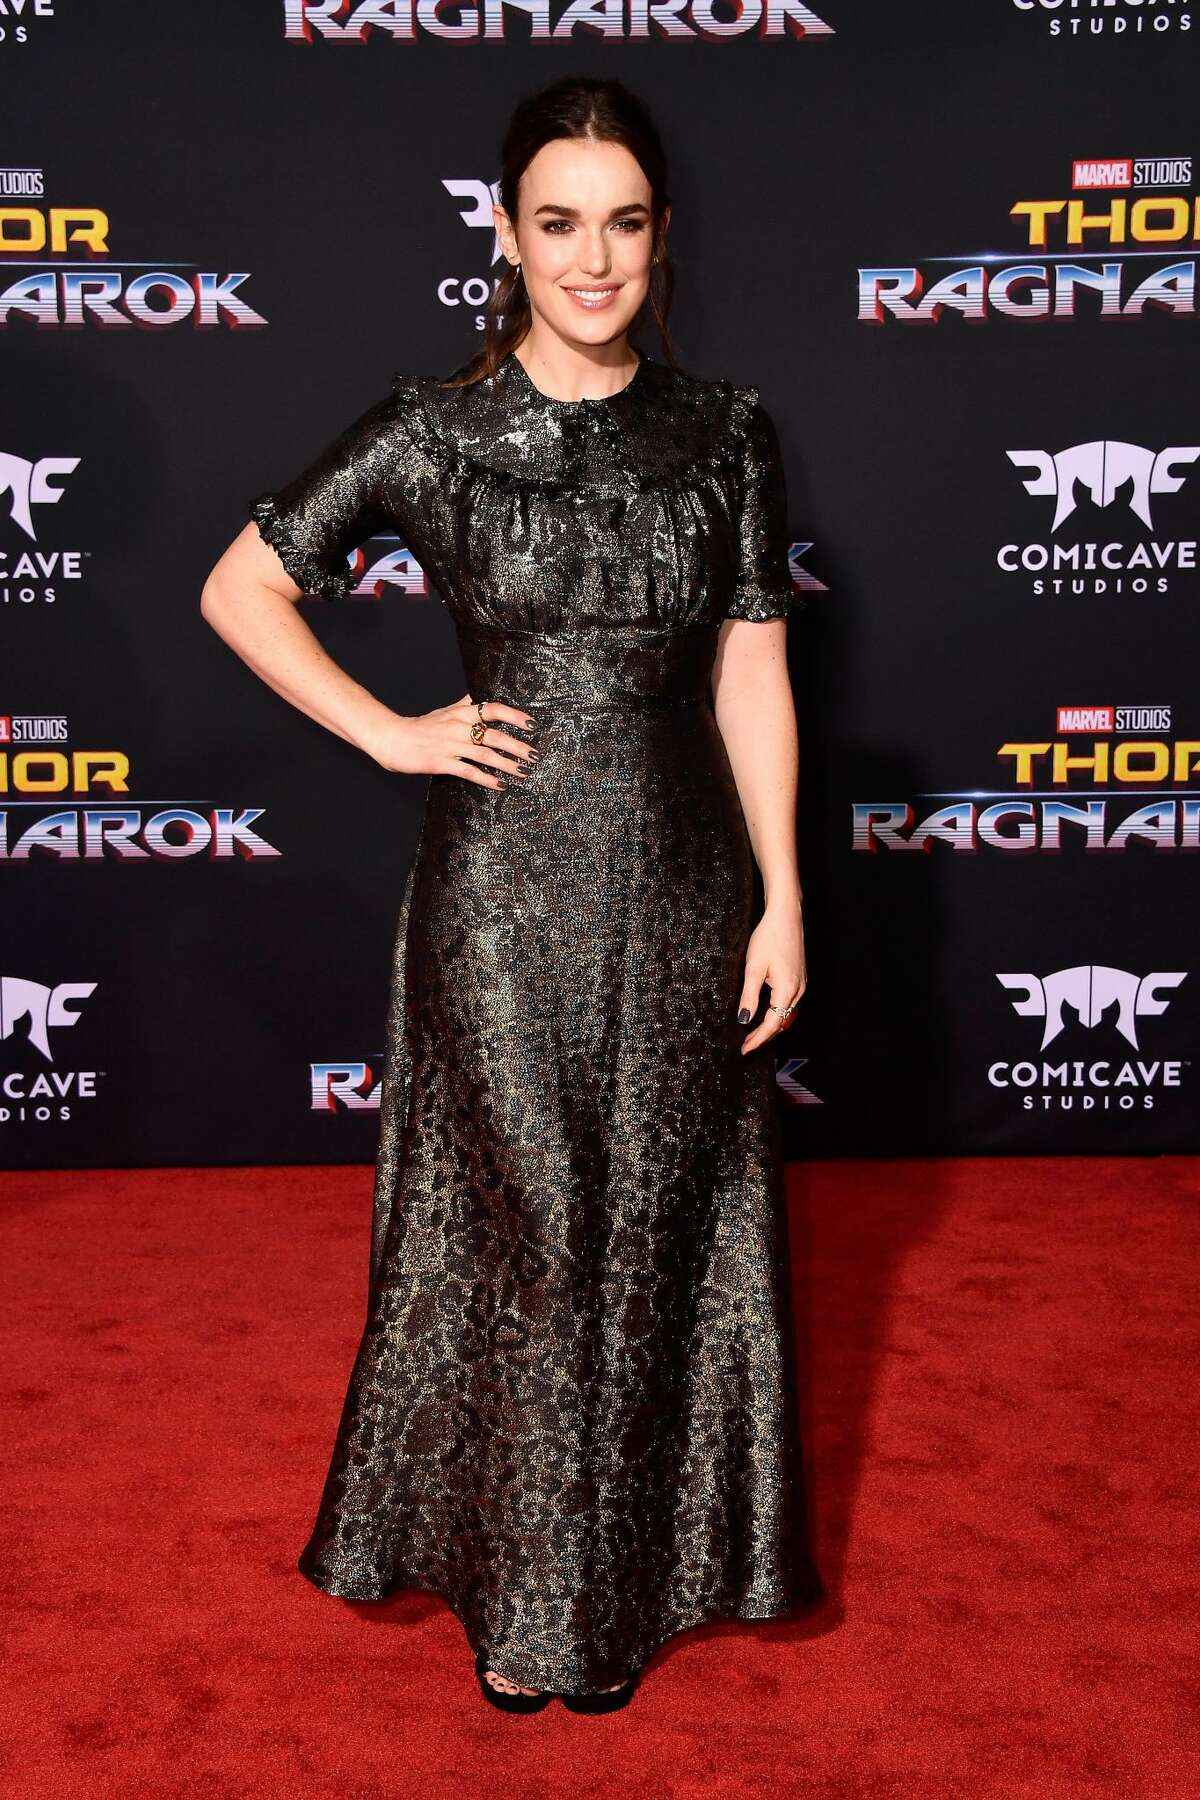 LOS ANGELES, CA - OCTOBER 10: Elizabeth Henstridge attends the premiere of Disney and Marvel's